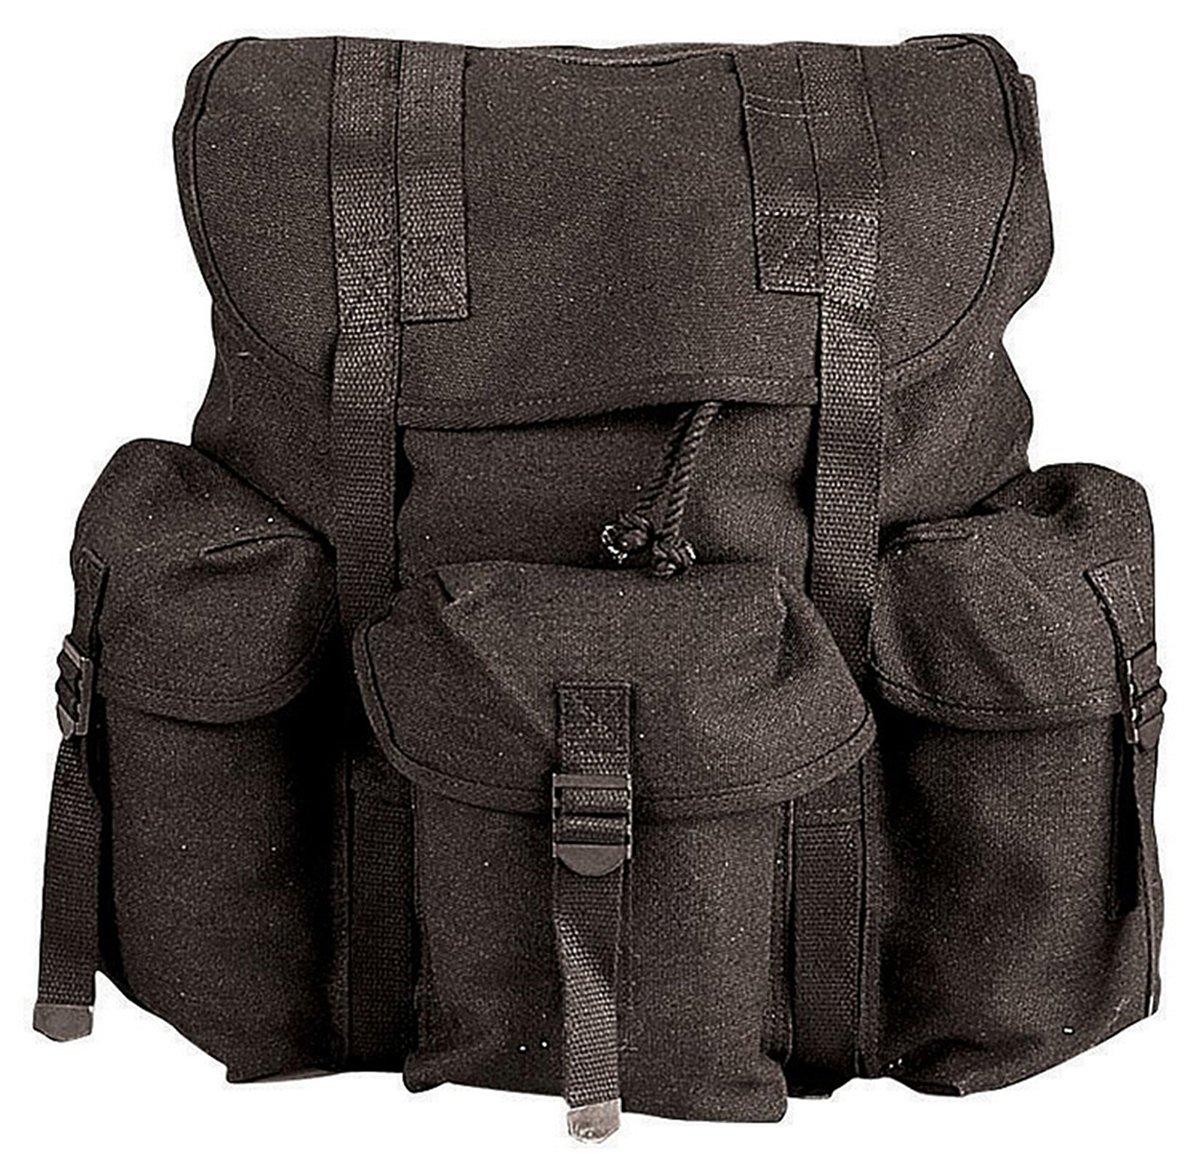 Amazon.com   G.I. TYPE HW CANVAS MINI ALICE PACKS - BLACK   Tactical ... 74fac90a72cbe